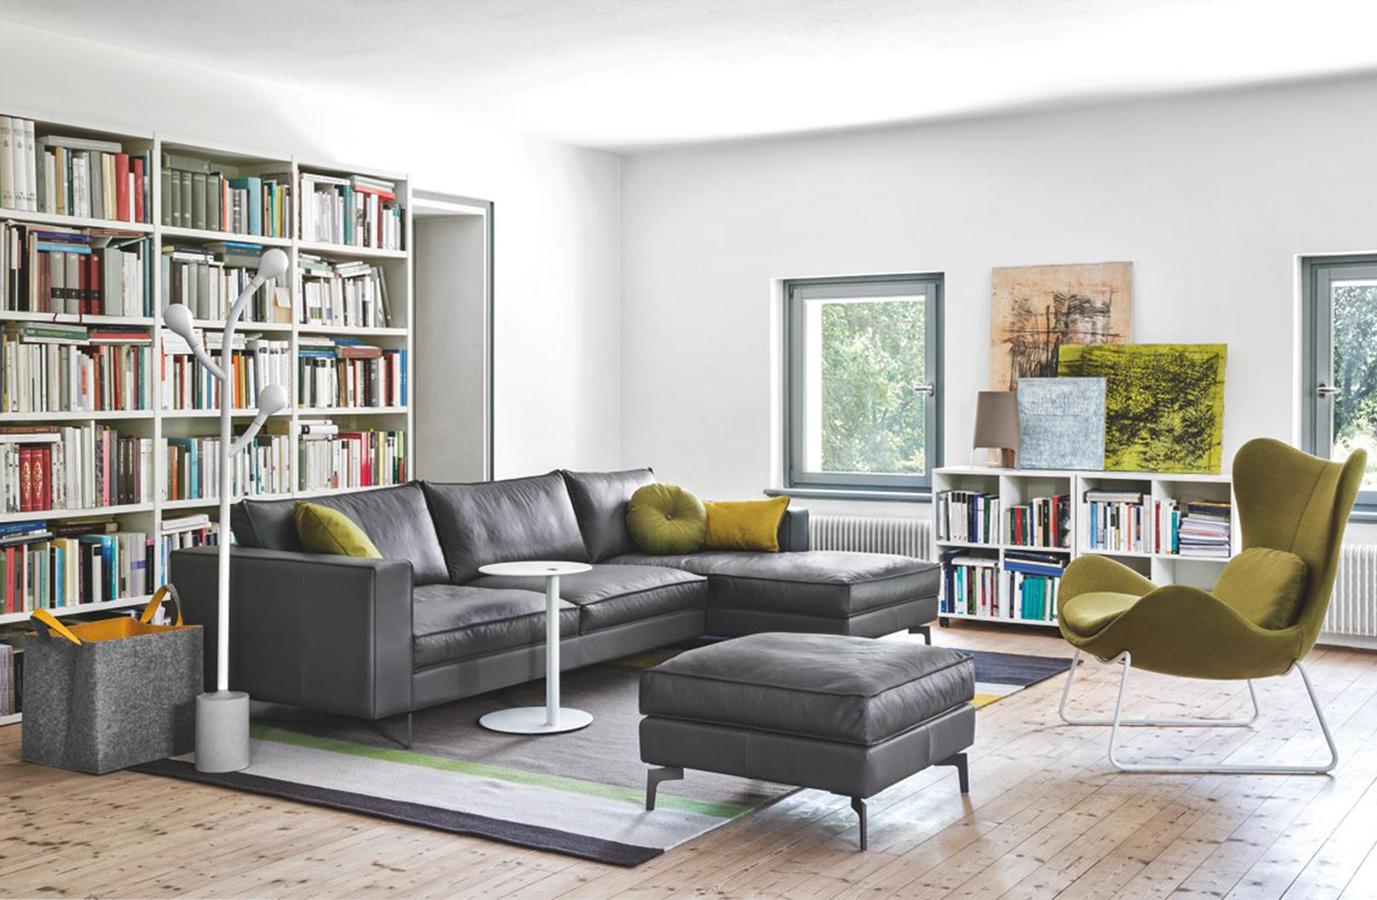 Calligaris divano square moderno design stoffa pelle ecopelle